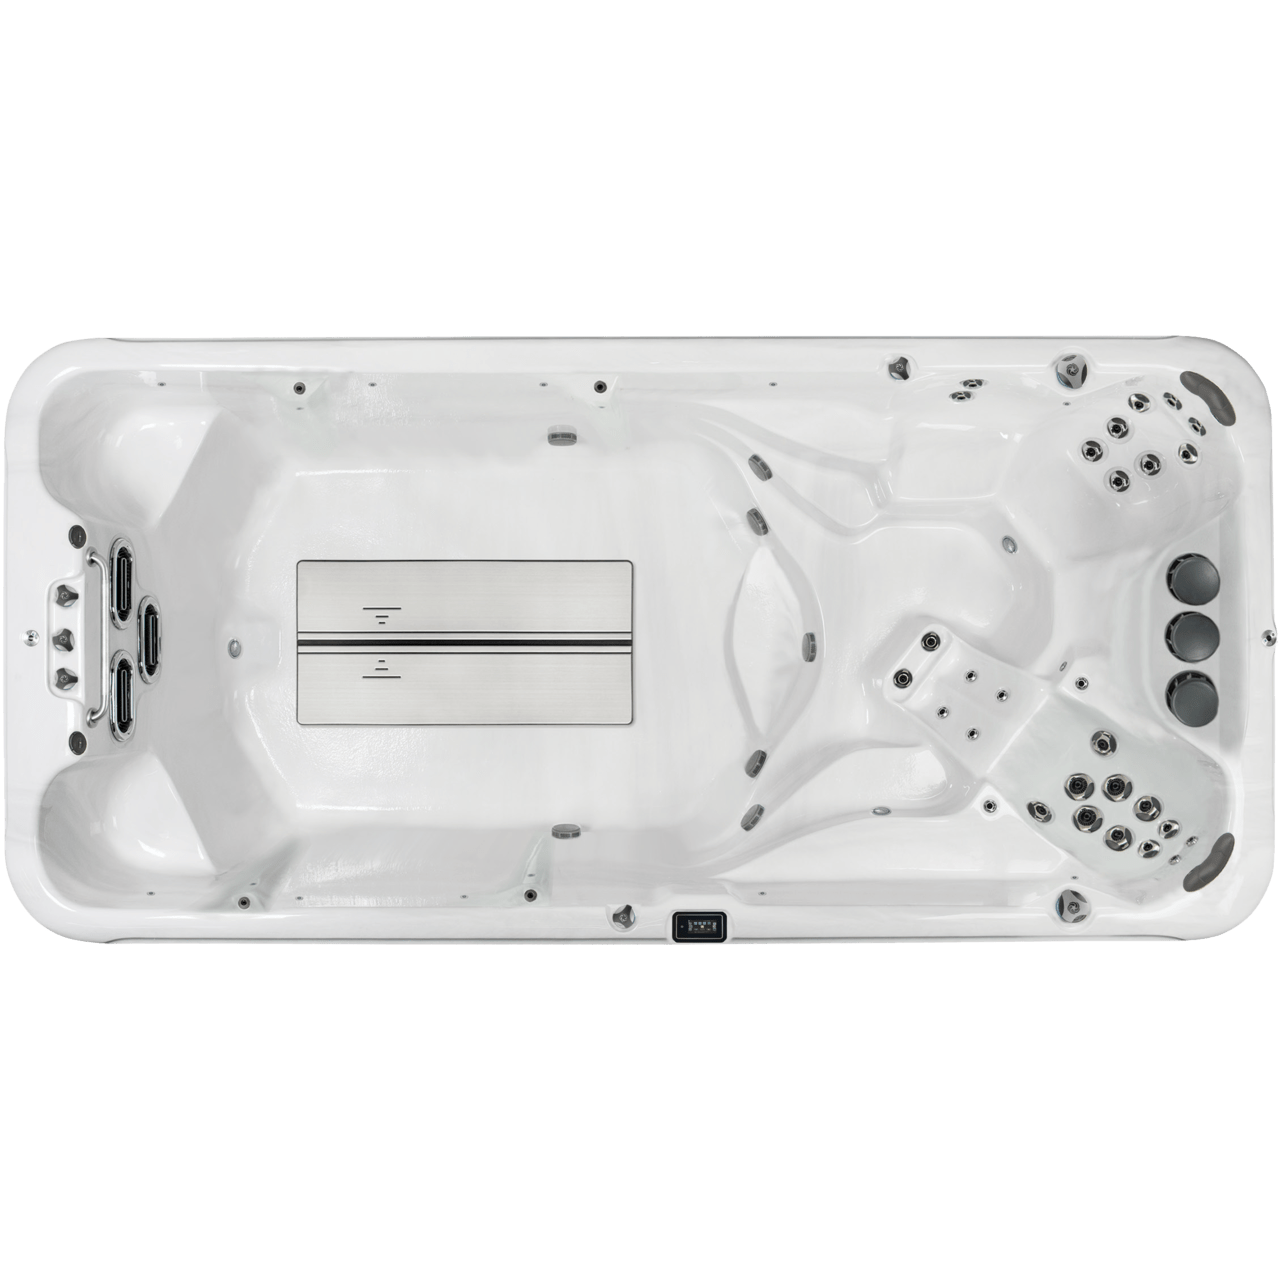 PowerPool MX6 Swim Spa & Hot Tub